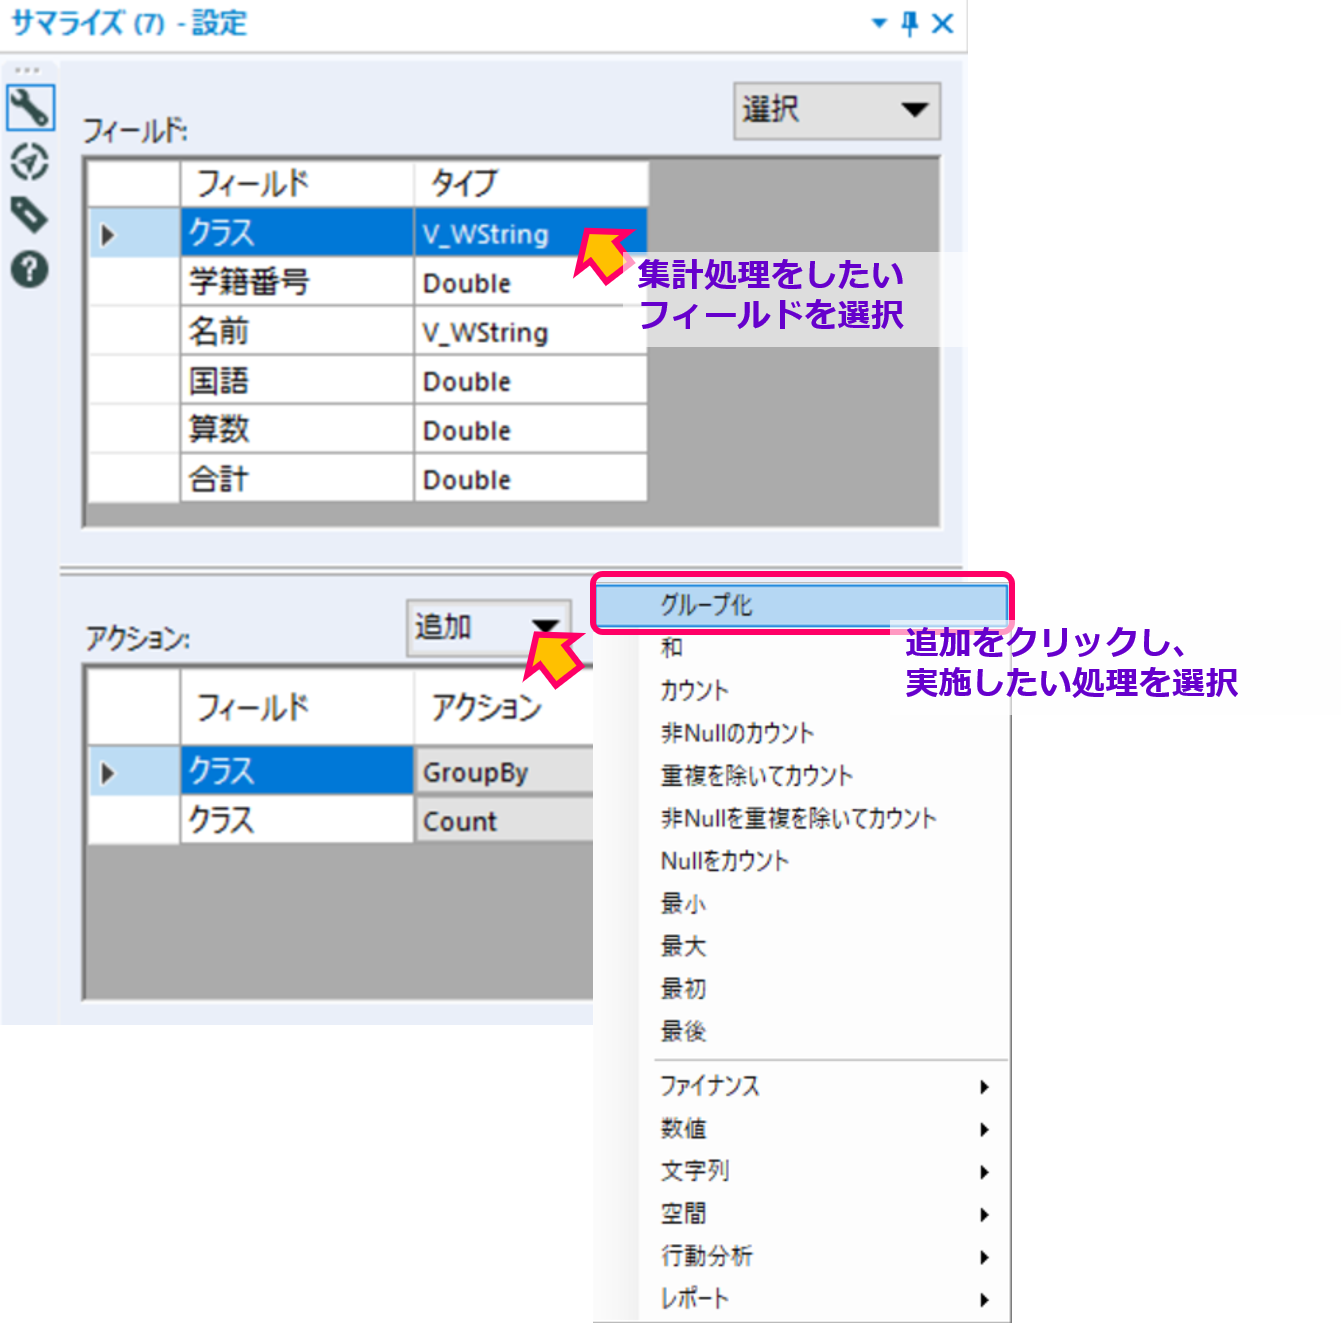 Alteryx Excel 関数 一覧 対比 COUNTIF Summarize サマライズ ツール Configuration 設定 画面2